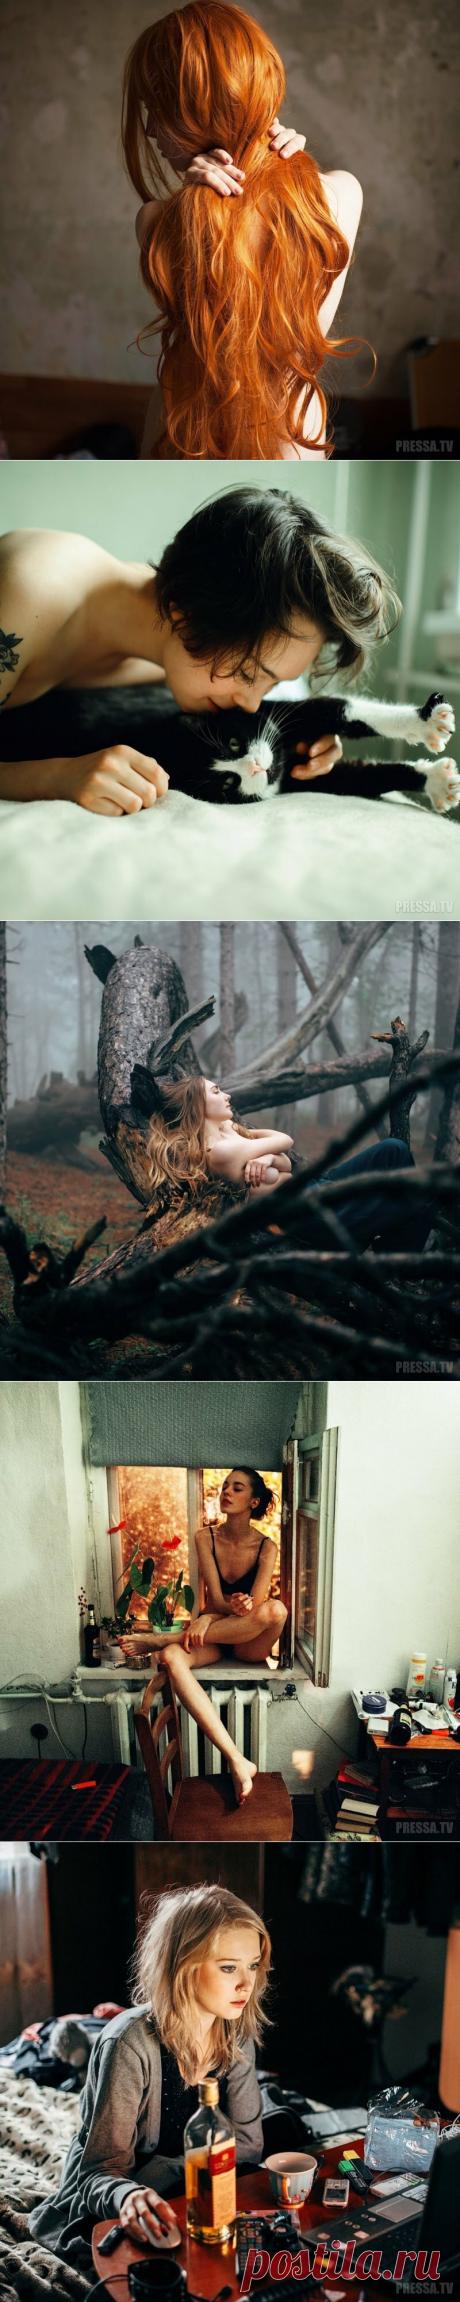 Женская красота в фотографиях Марата Сафина | ФОТОBLOG | Яндекс Дзен